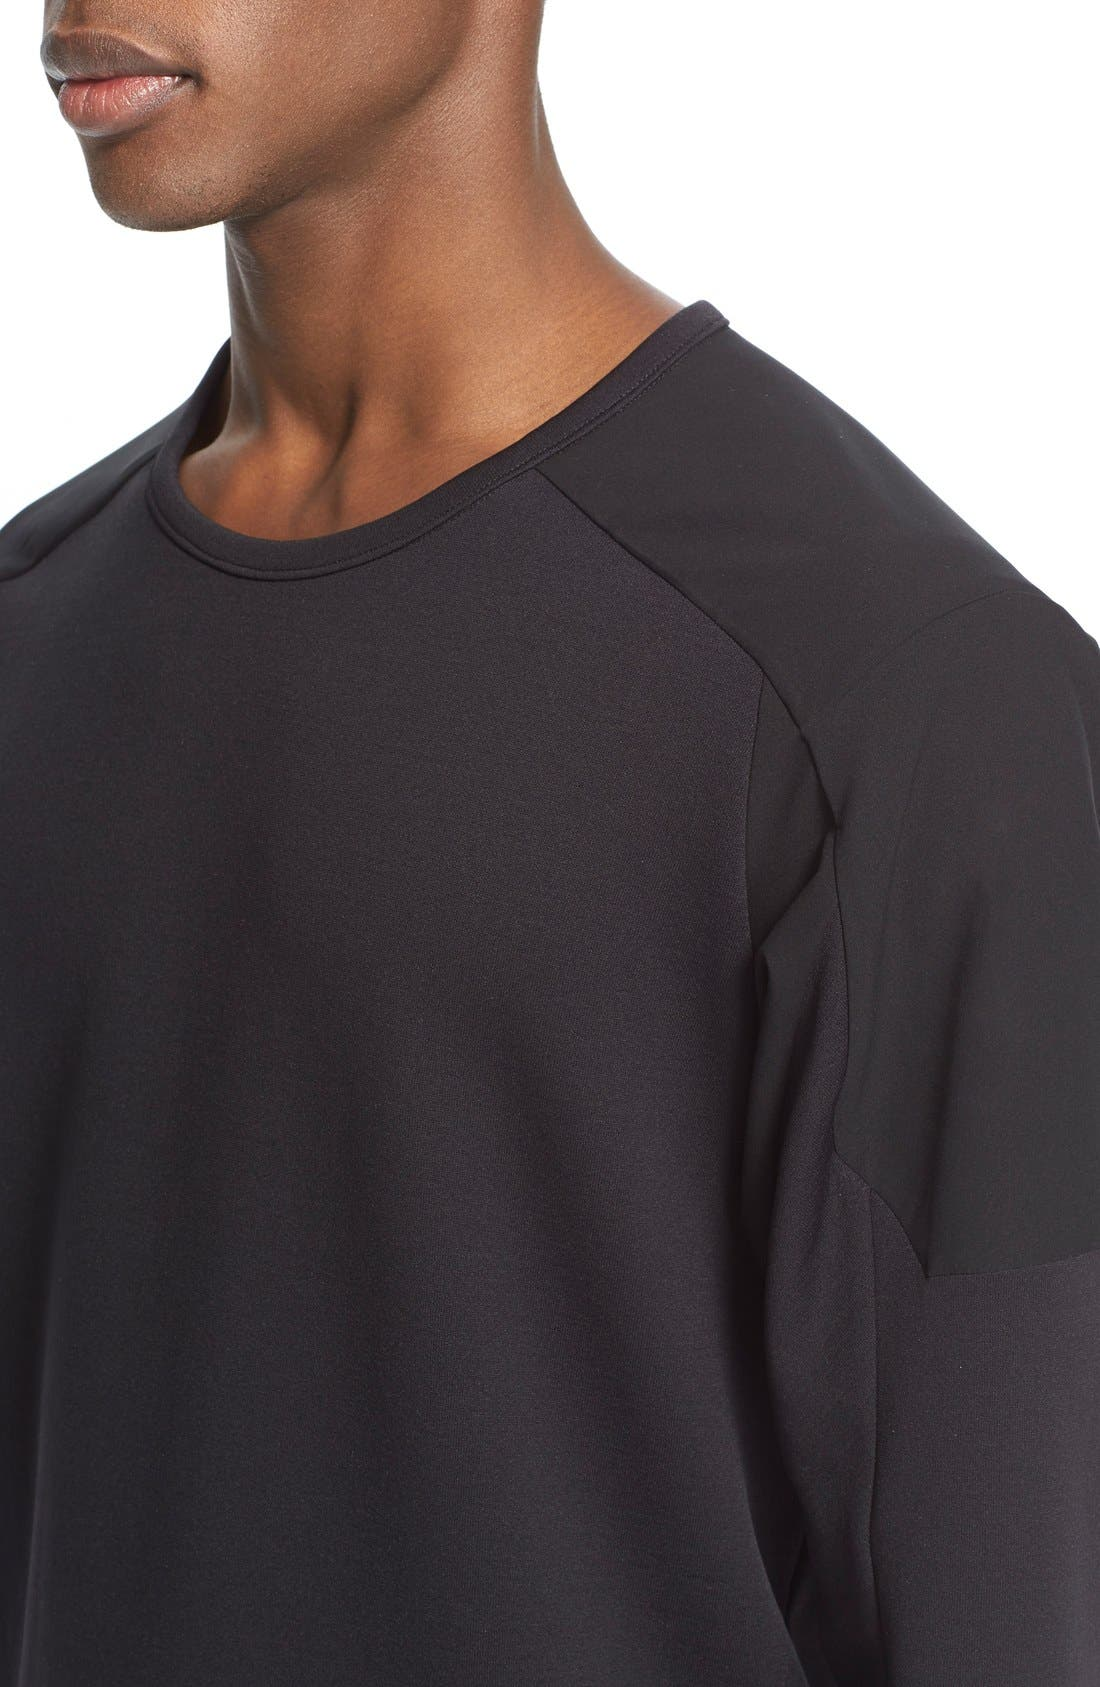 Arc'teryxVeilance'Graph' Sweater,                             Alternate thumbnail 4, color,                             Black